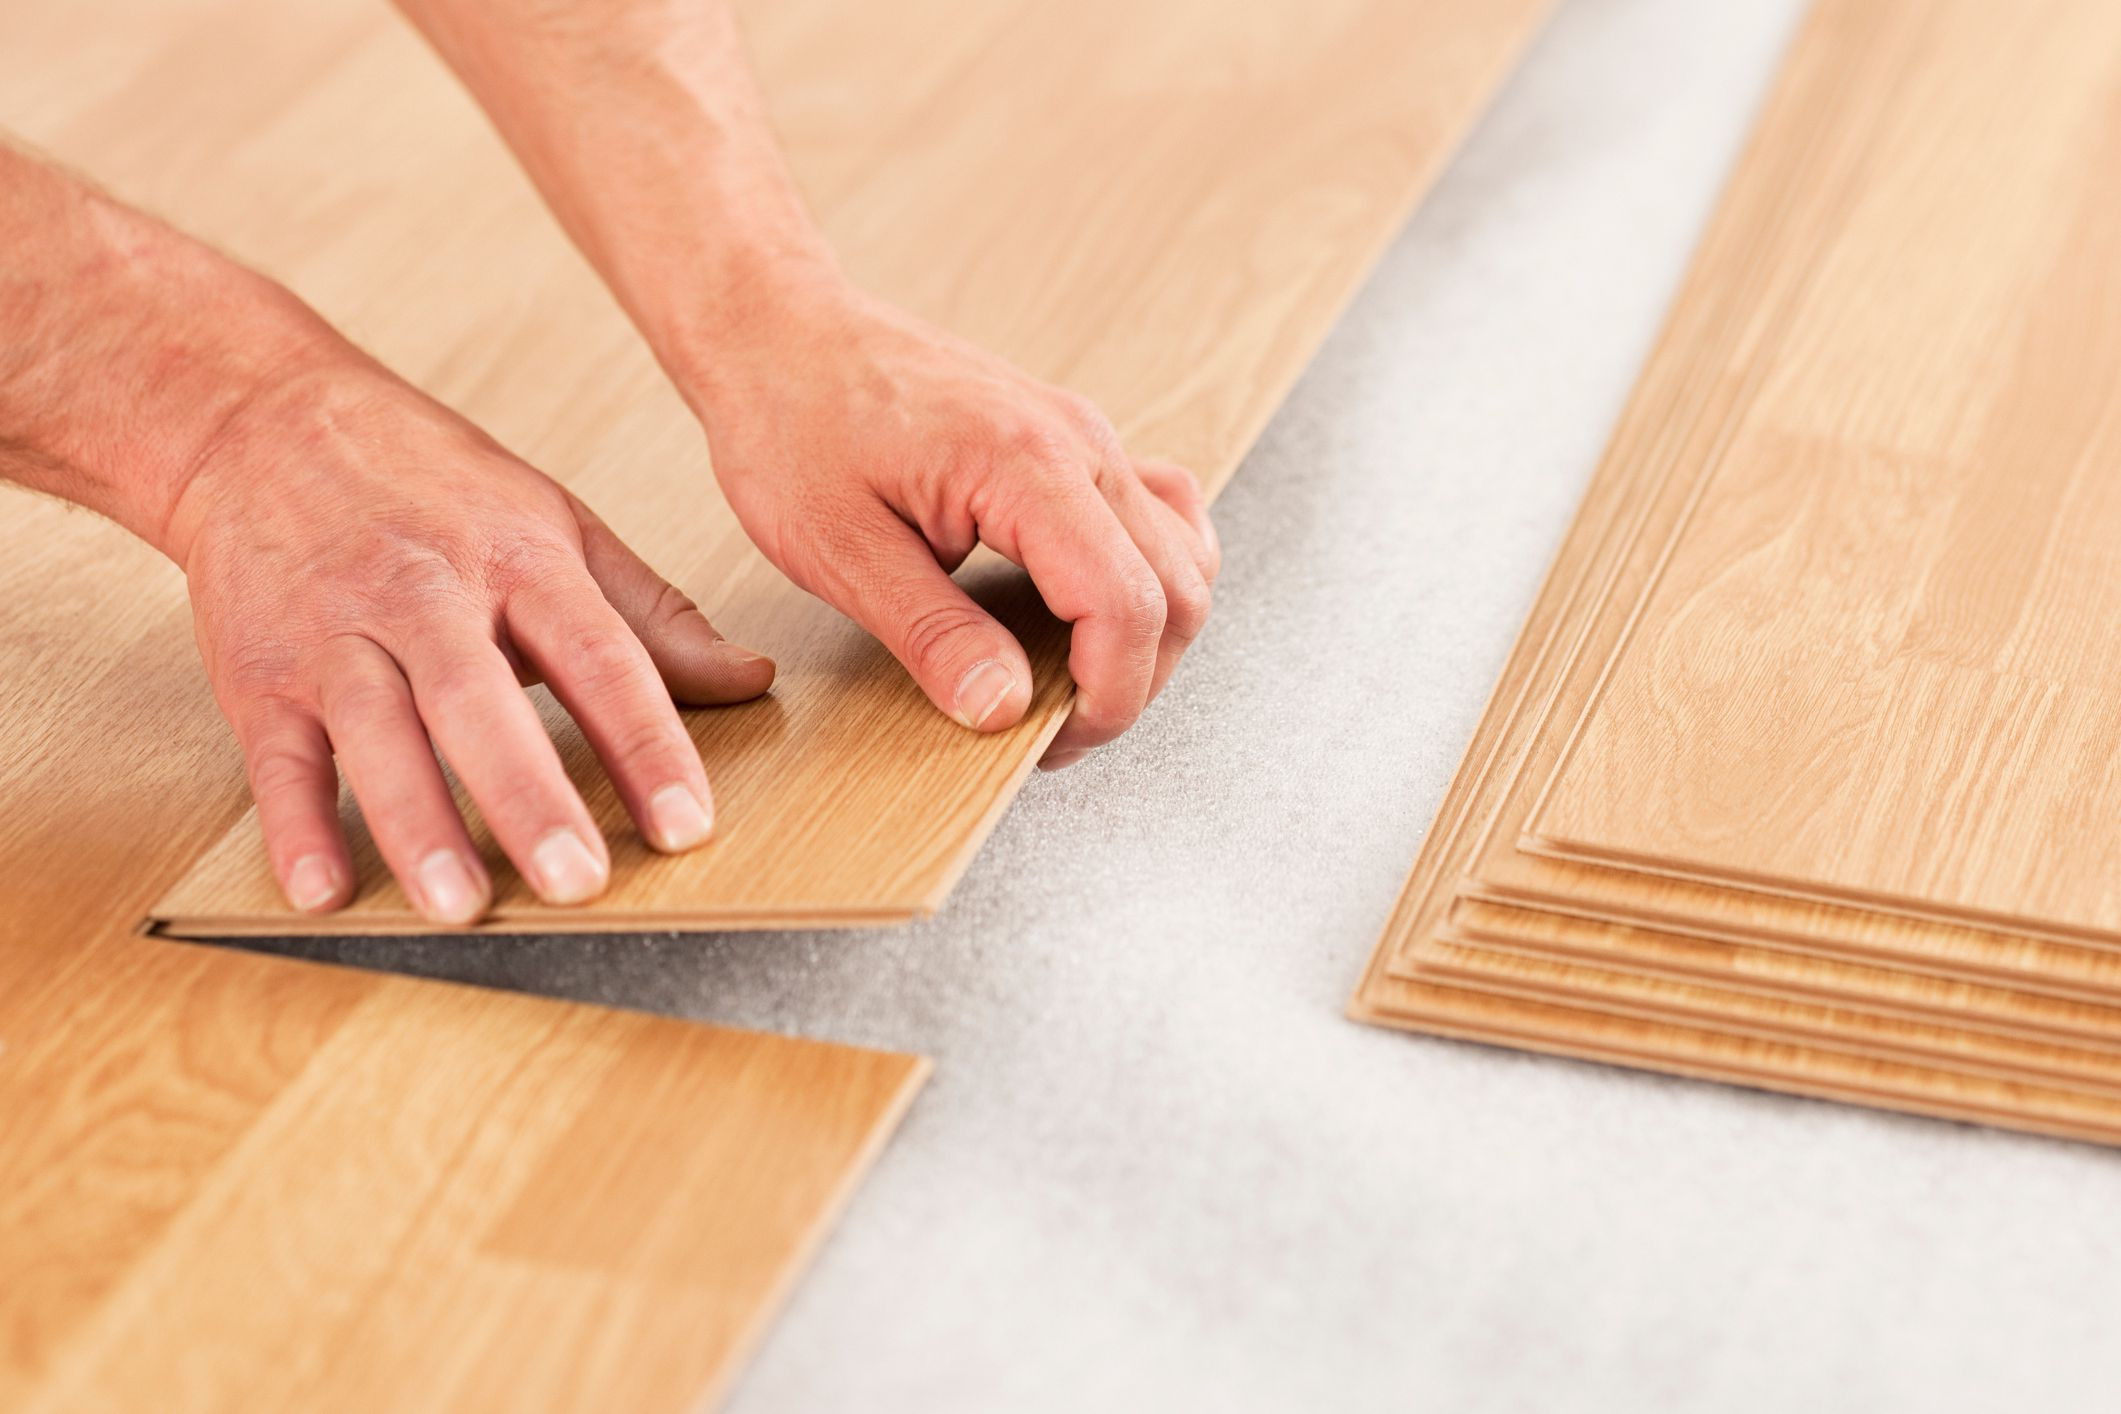 21 attractive Diy Hardwood Floor Installation On Concrete 2021 free download diy hardwood floor installation on concrete of laminate underlayment pros and cons inside laminate floor install gettyimages 154961561 588816495f9b58bdb3da1a02